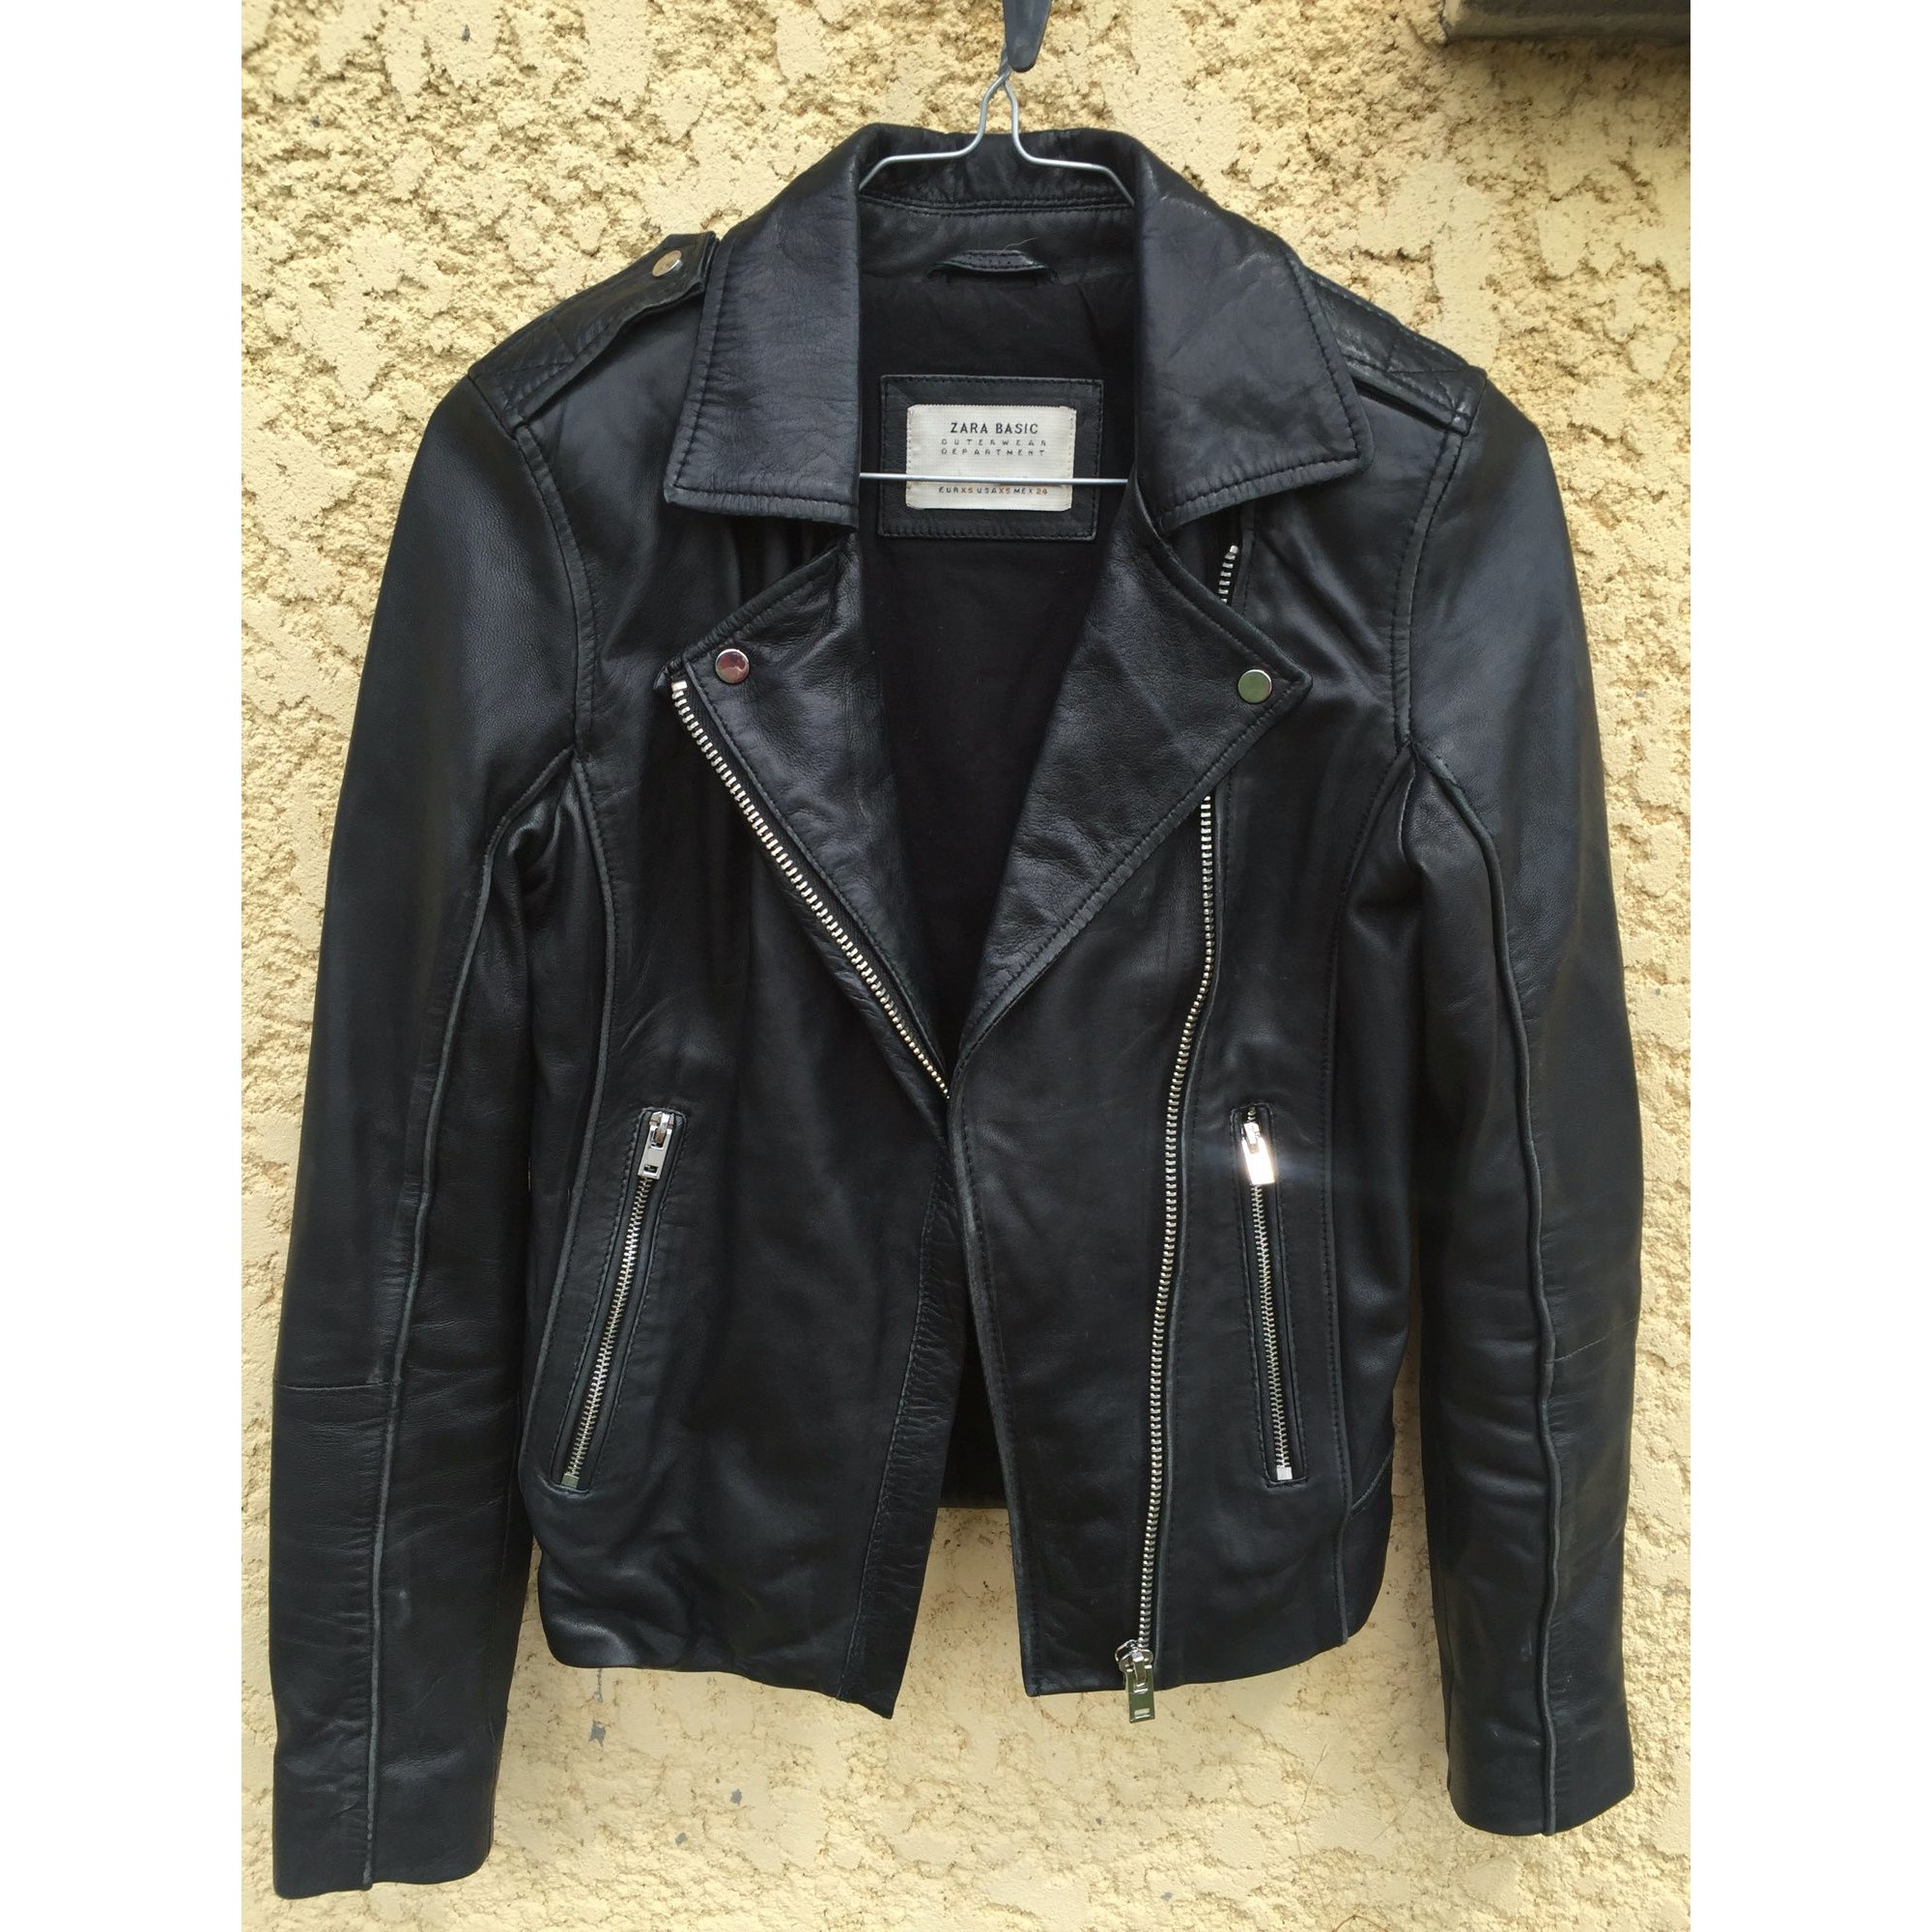 Veste en cuir ZARA 34 (XS, T0) noir 6515985